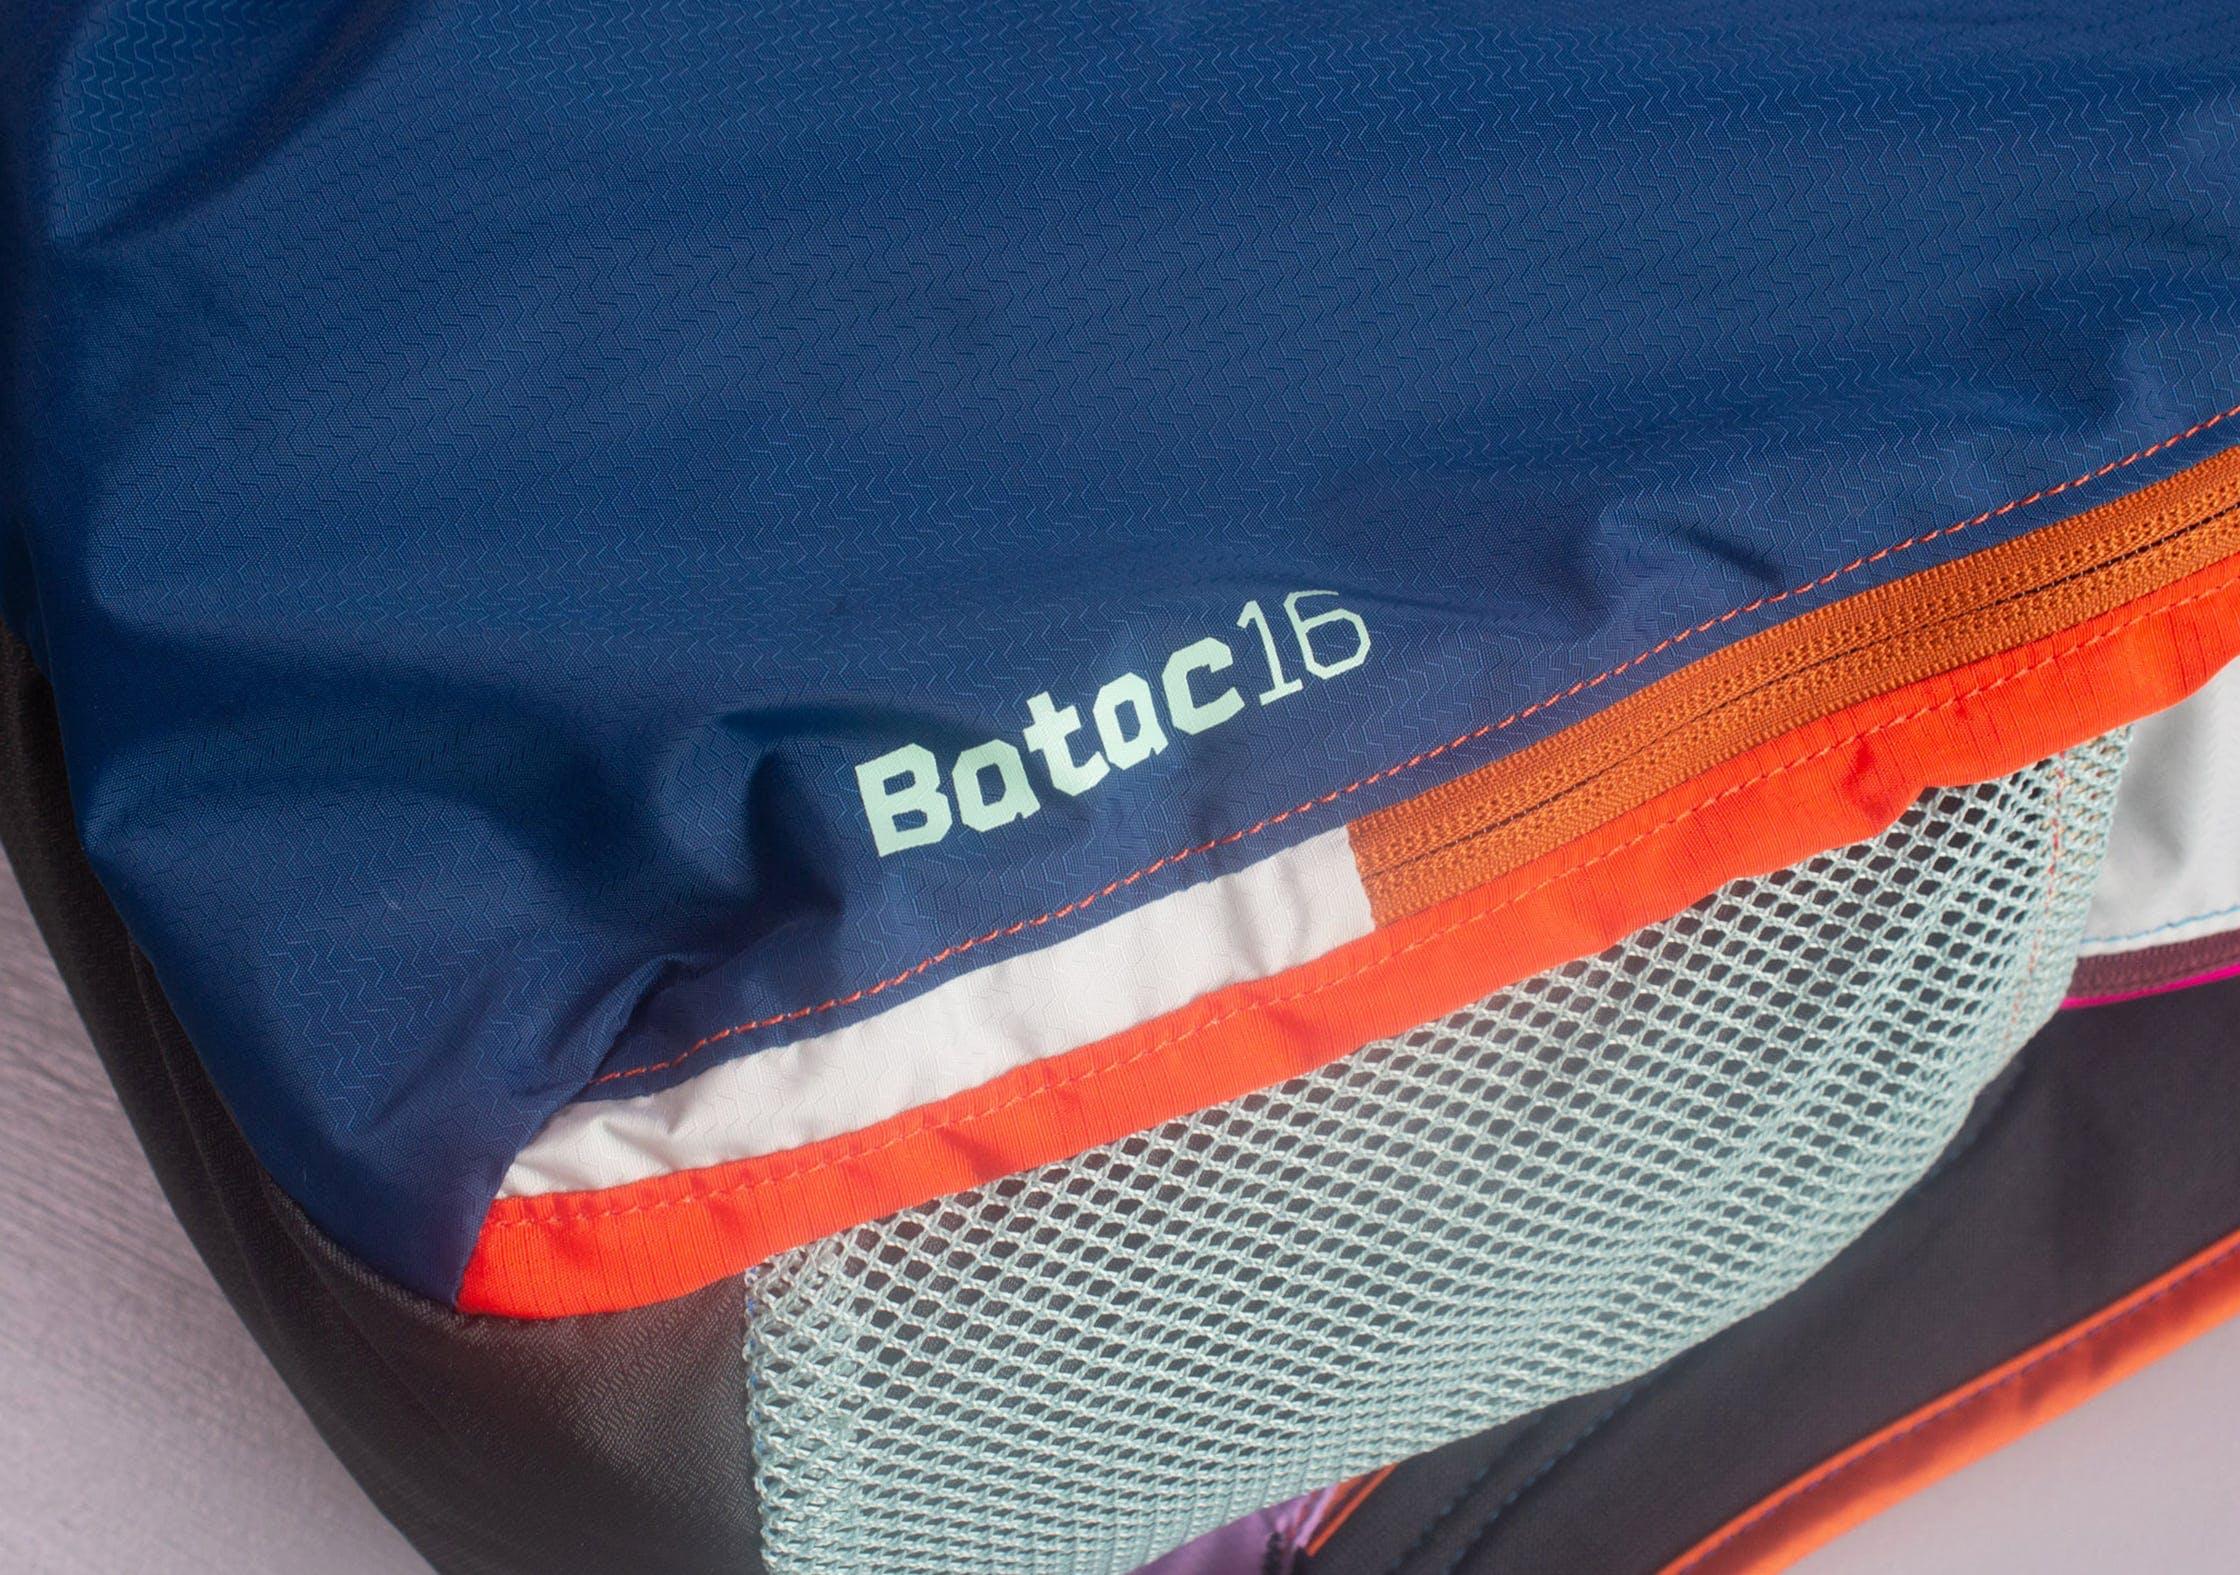 fb95c4707f Cotopaxi Batac 16L Daypack Review